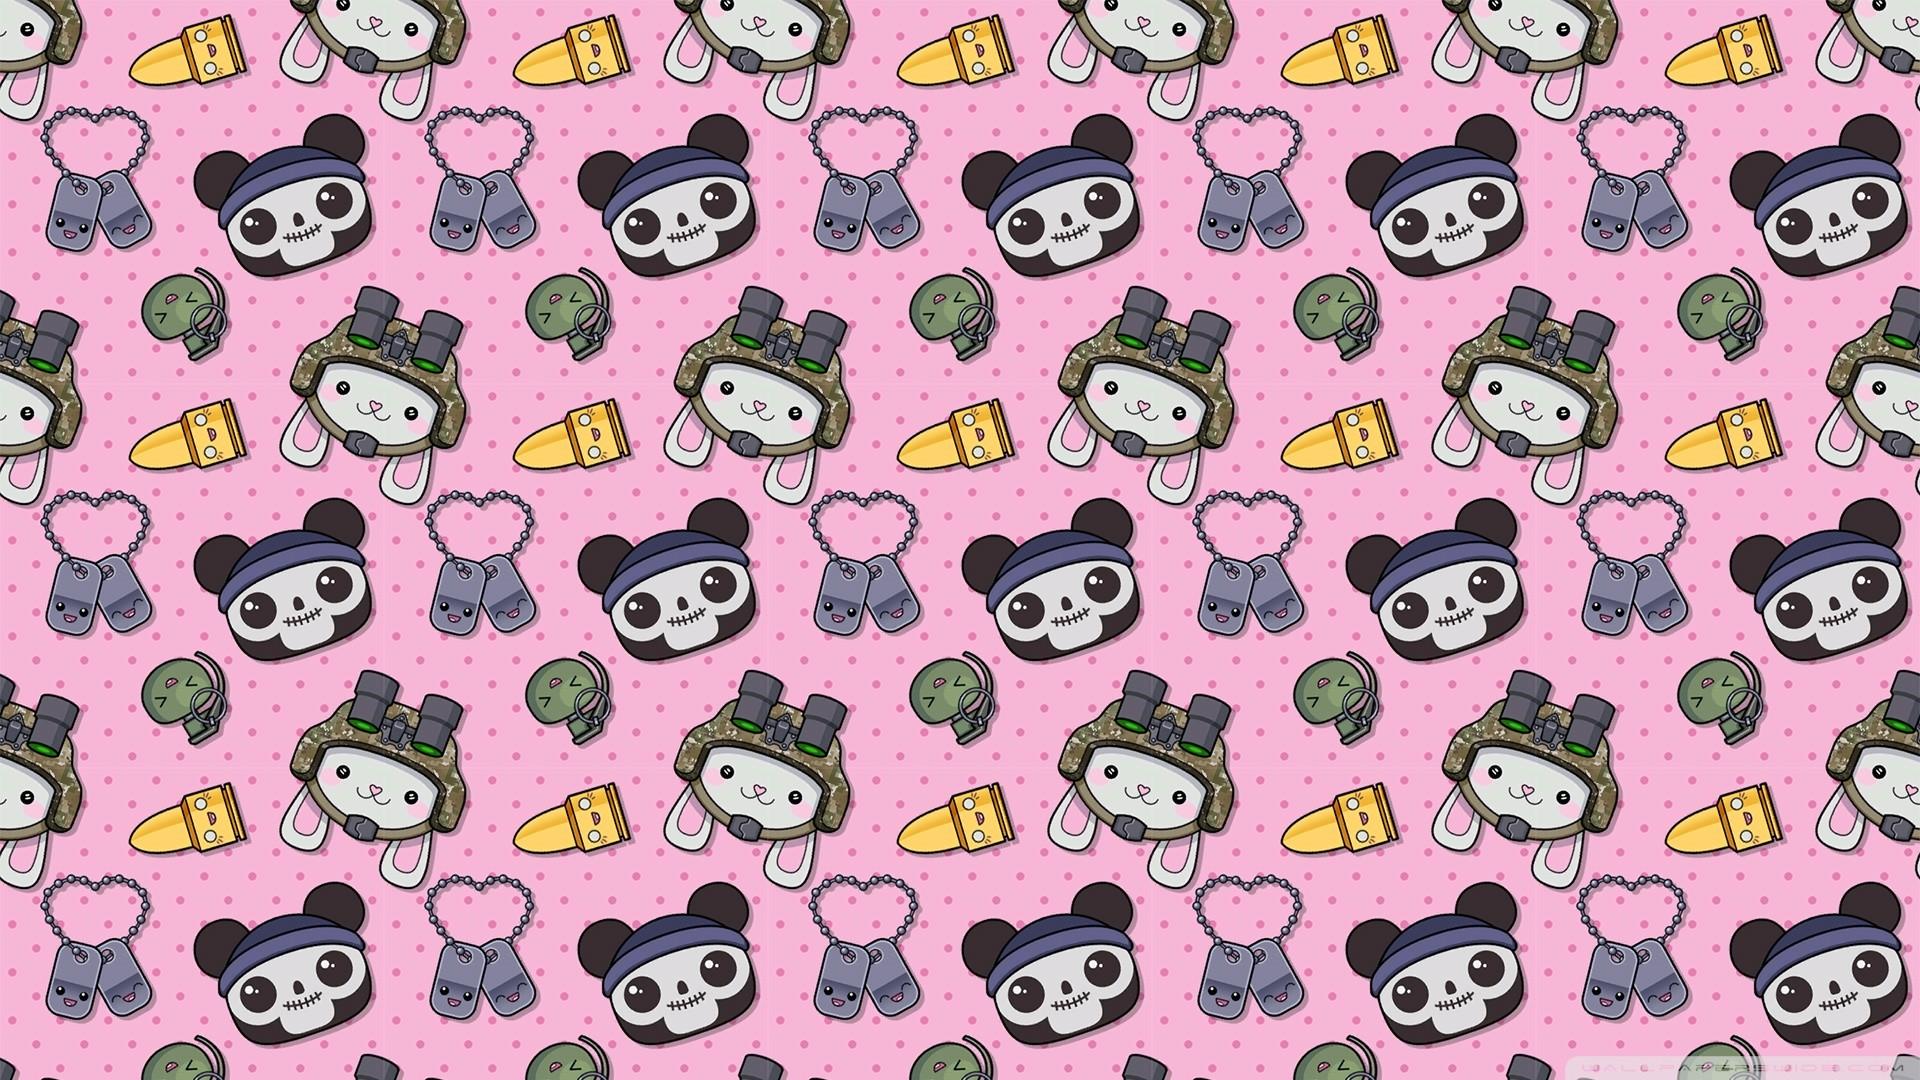 Cute kawaii wallpapers 74 images - Kawaii wallpaper hd ...